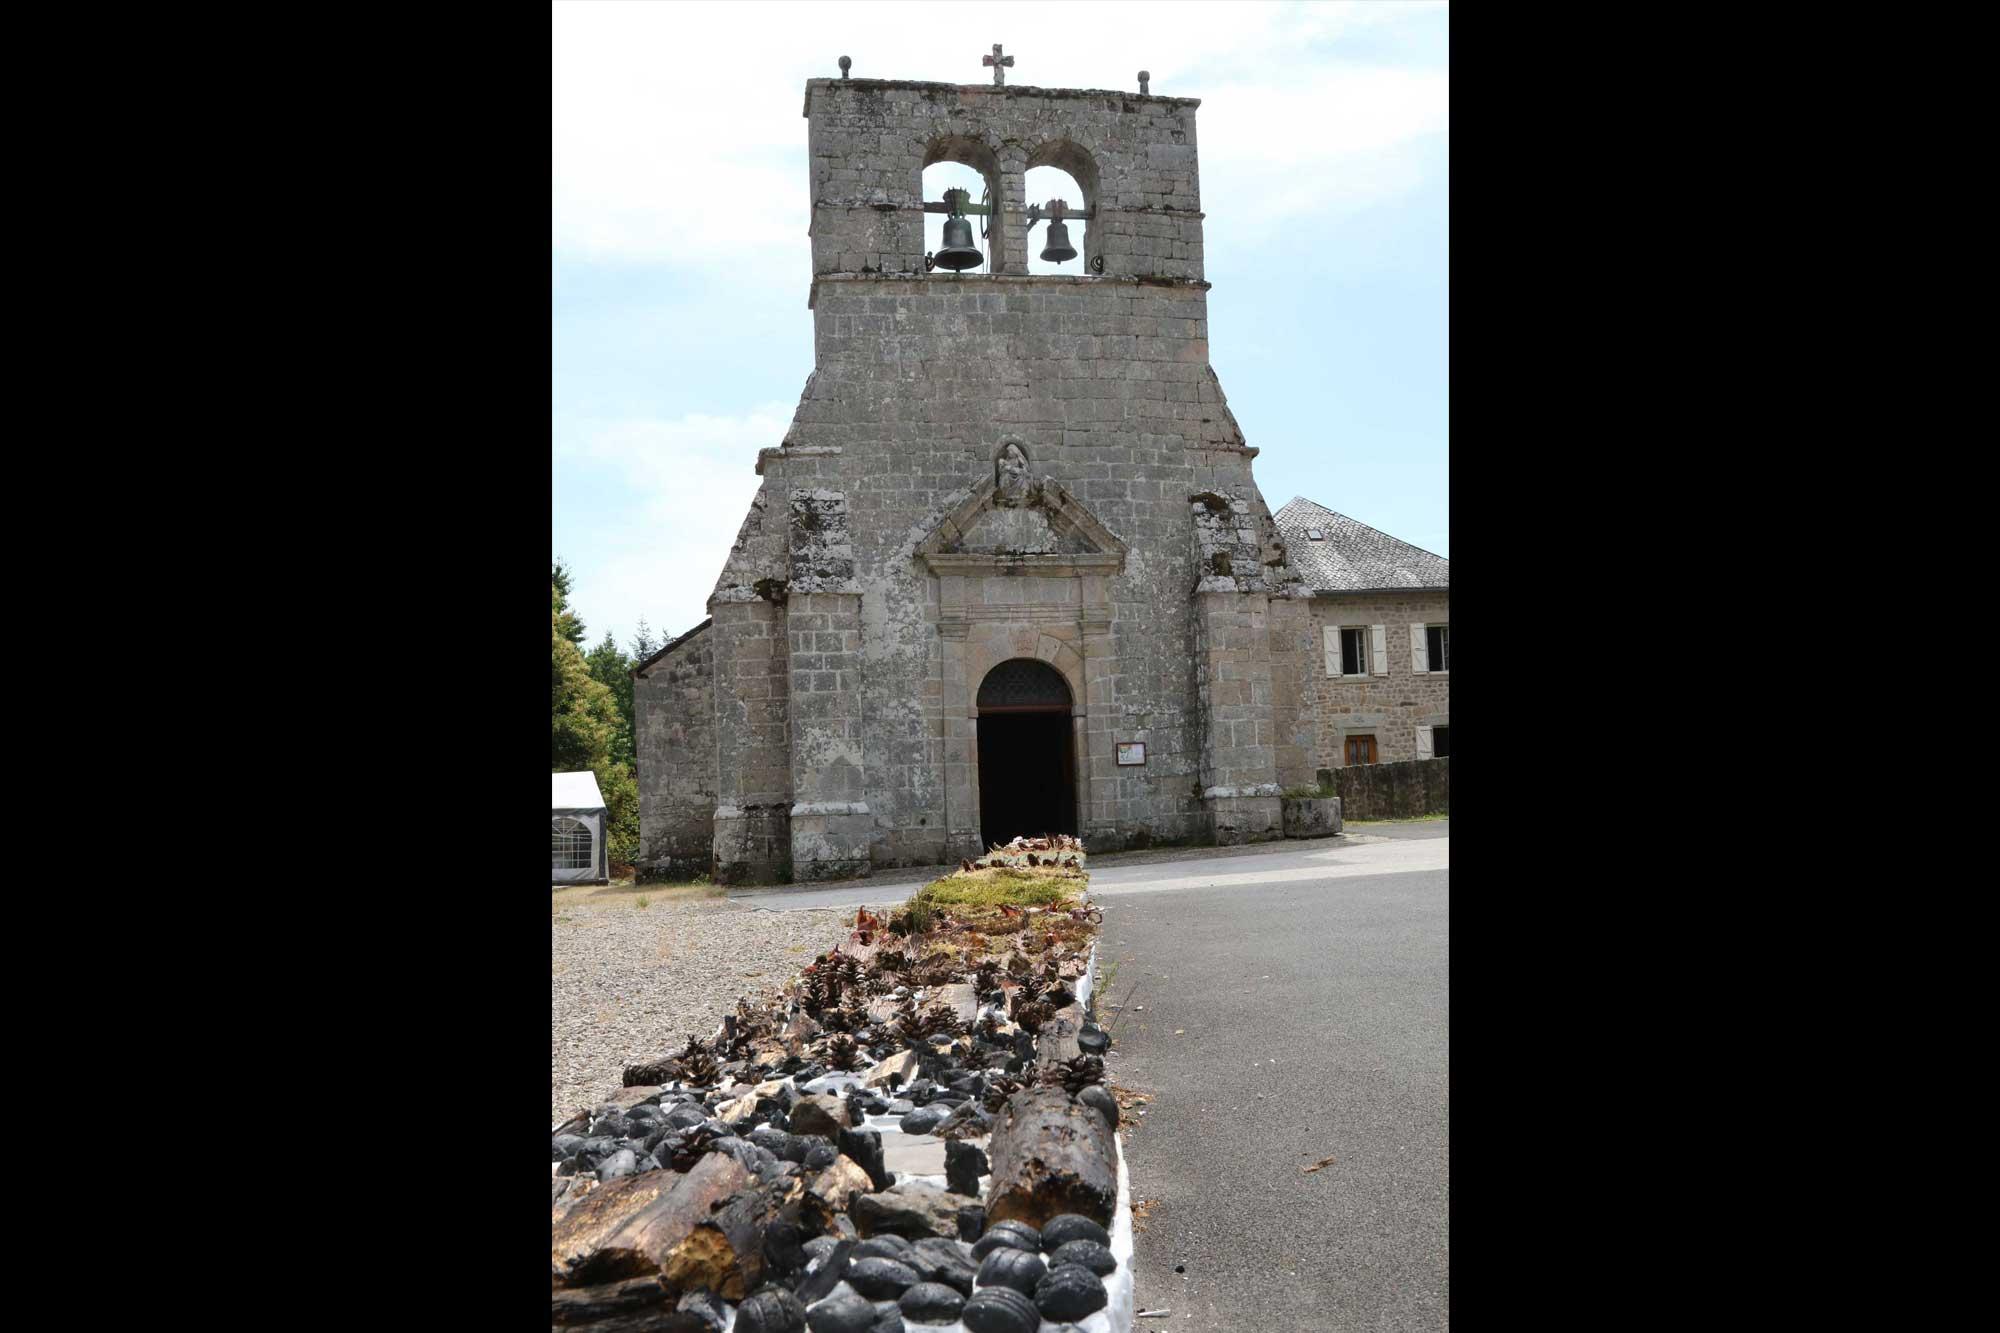 jean-pierre larroche saint-pardoux